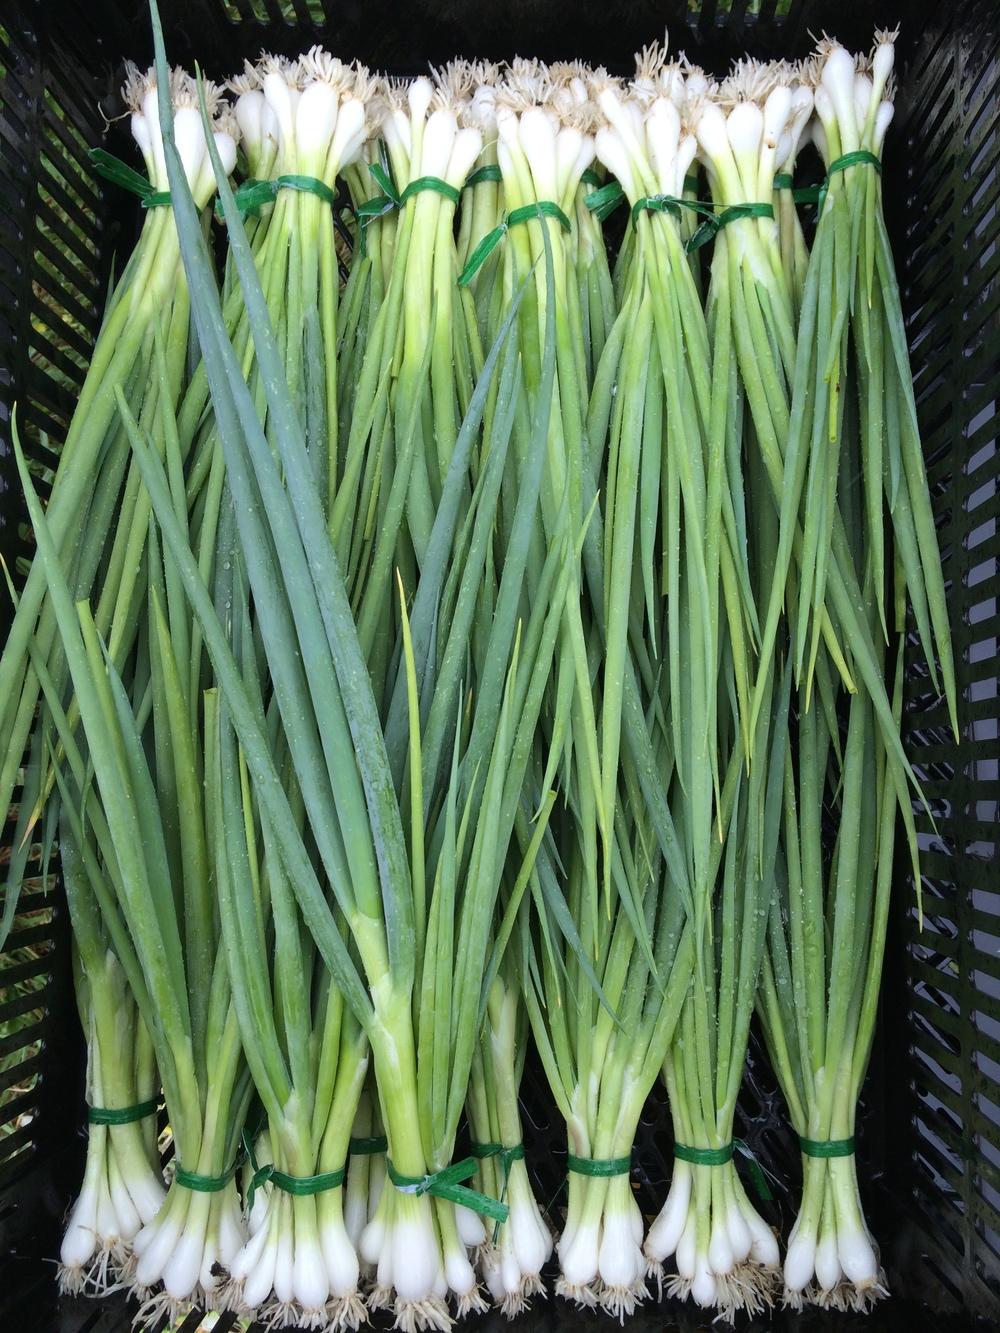 Parade green onions.